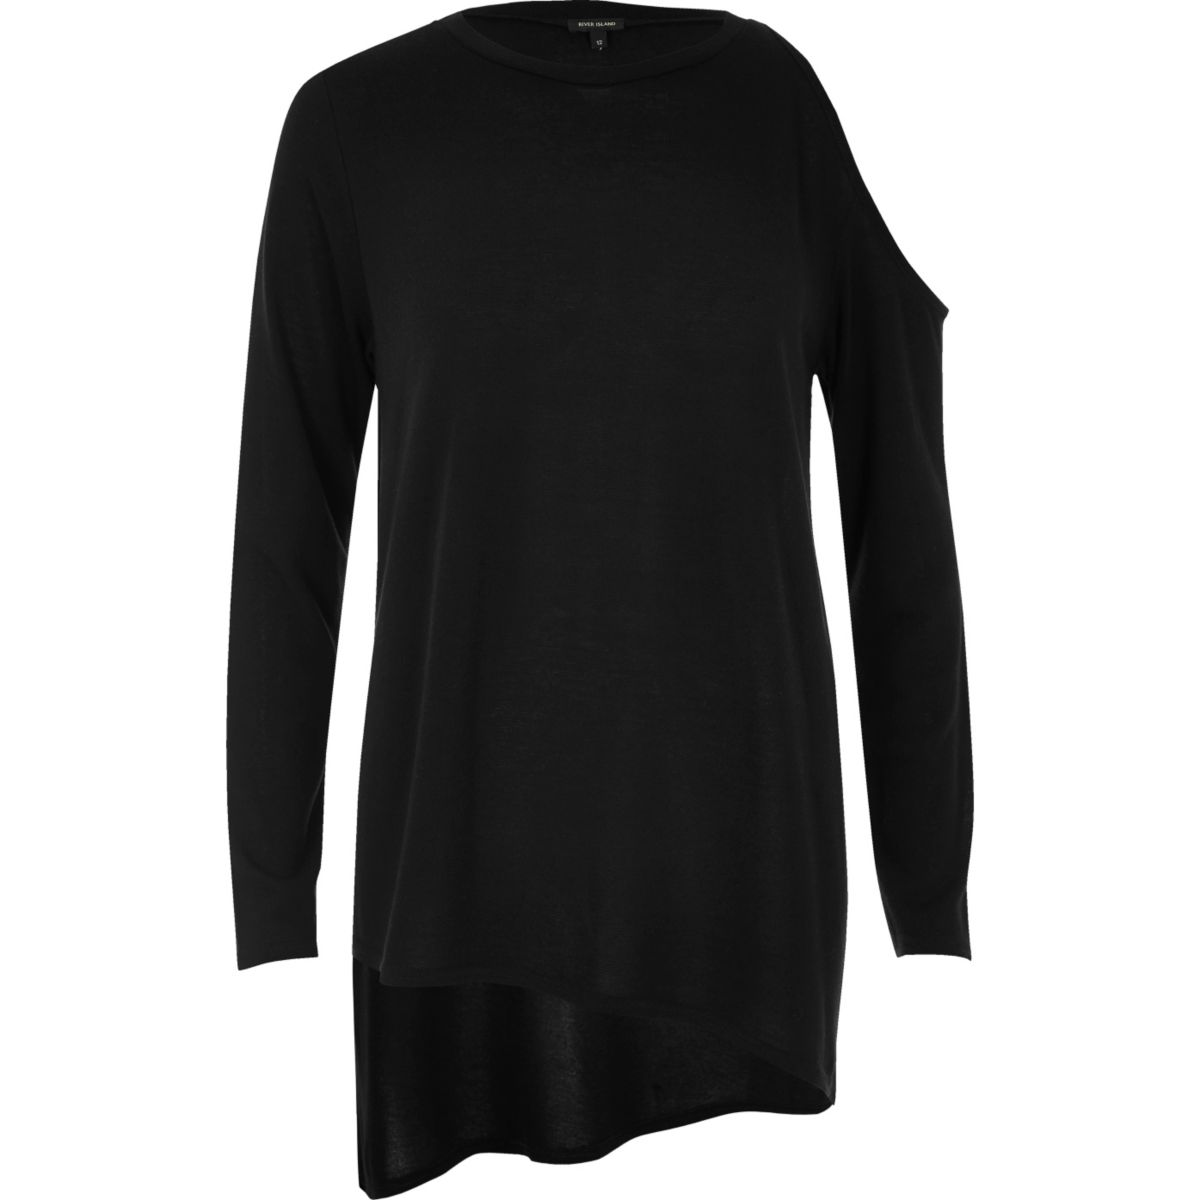 Zwarte asymmetrische schouderloze top